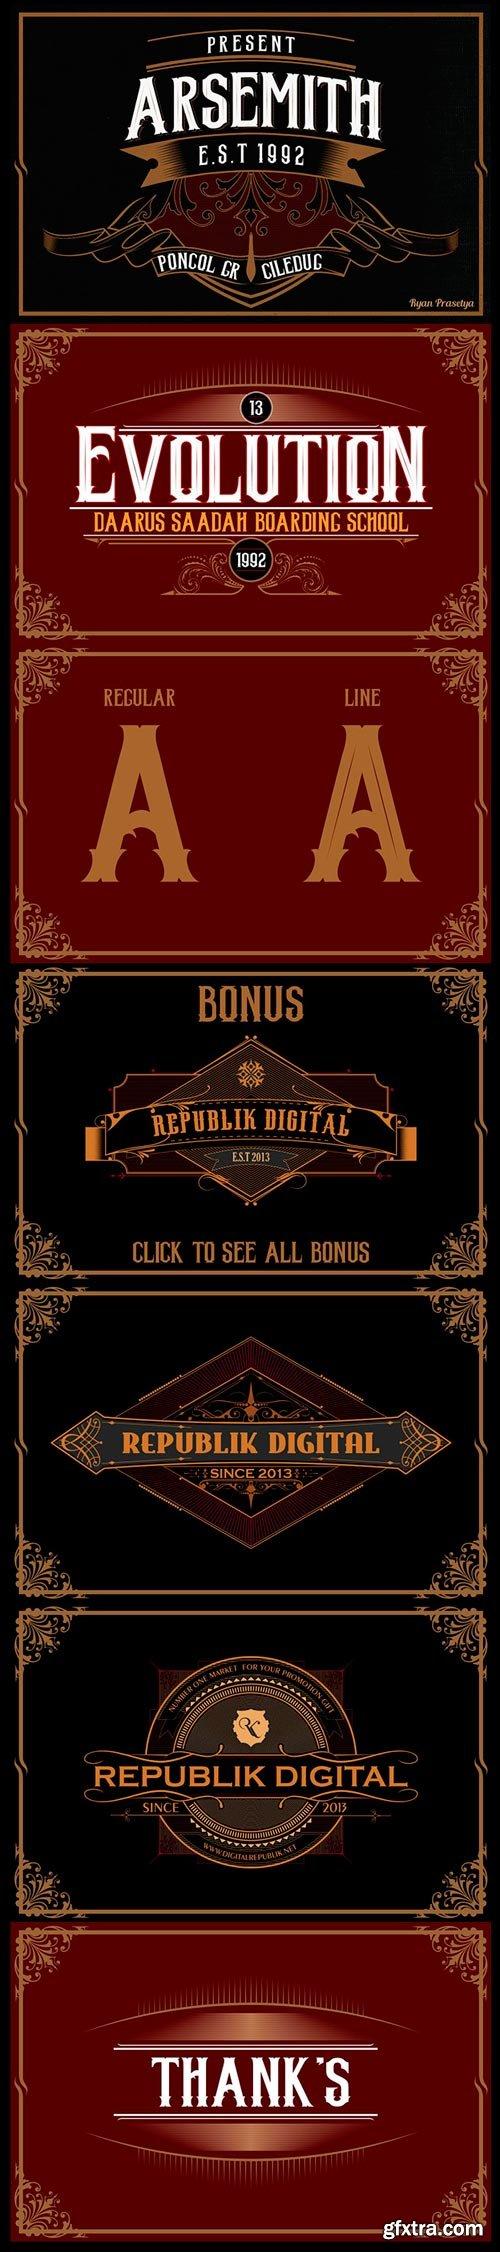 Arsemith + Bonus Poster & Artdeco